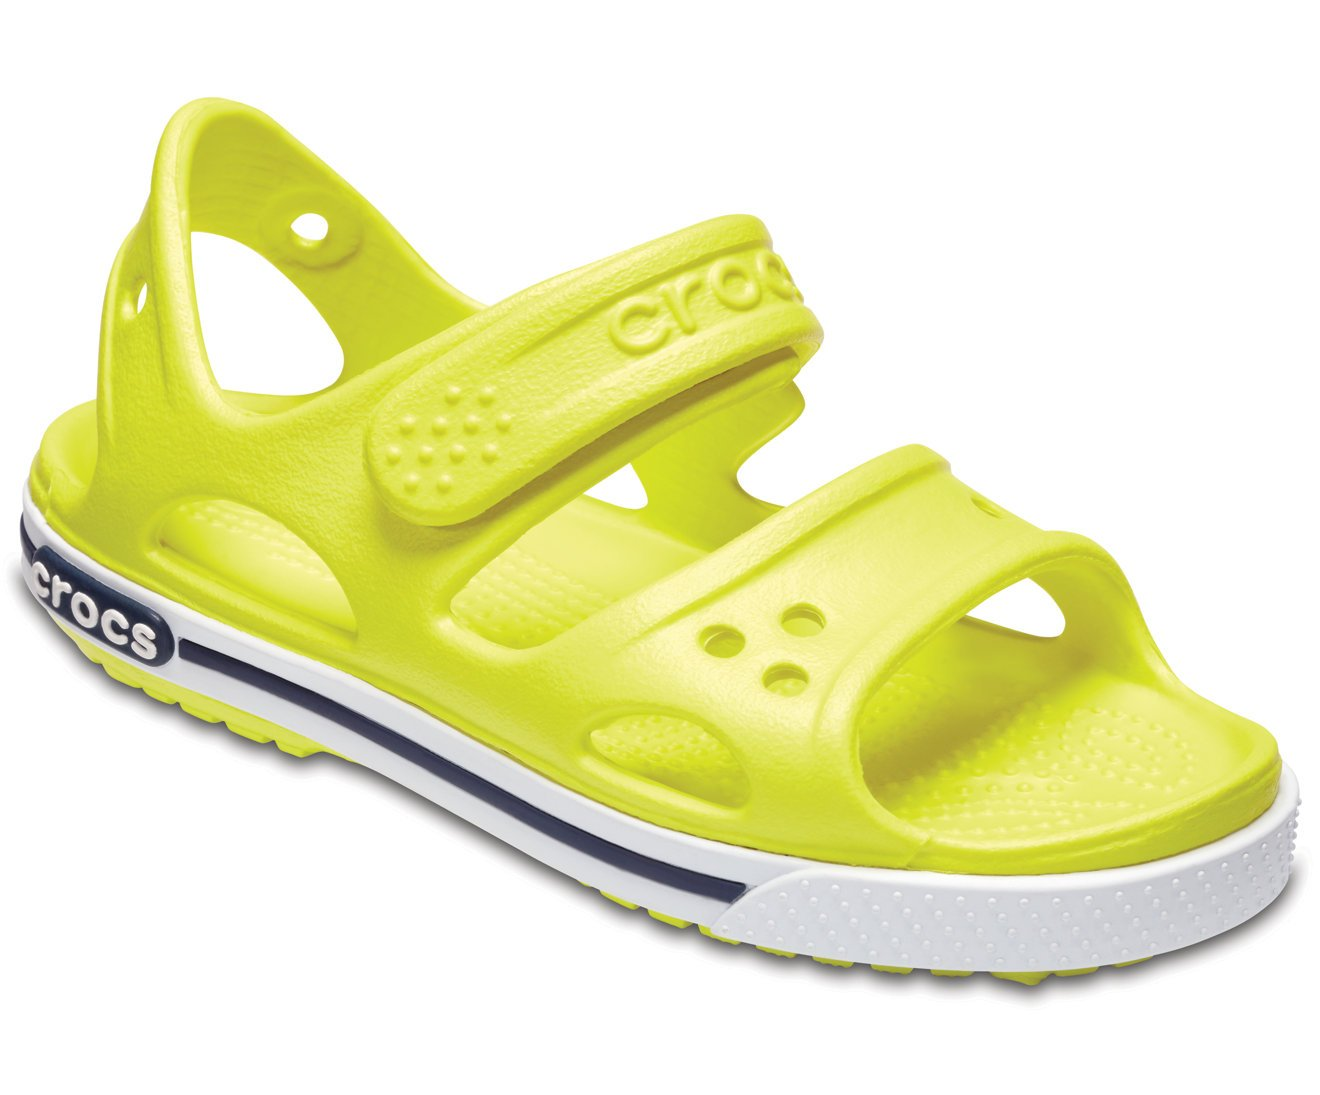 Crocs Crocband II Sandal Kids by Crocs (Image #1)